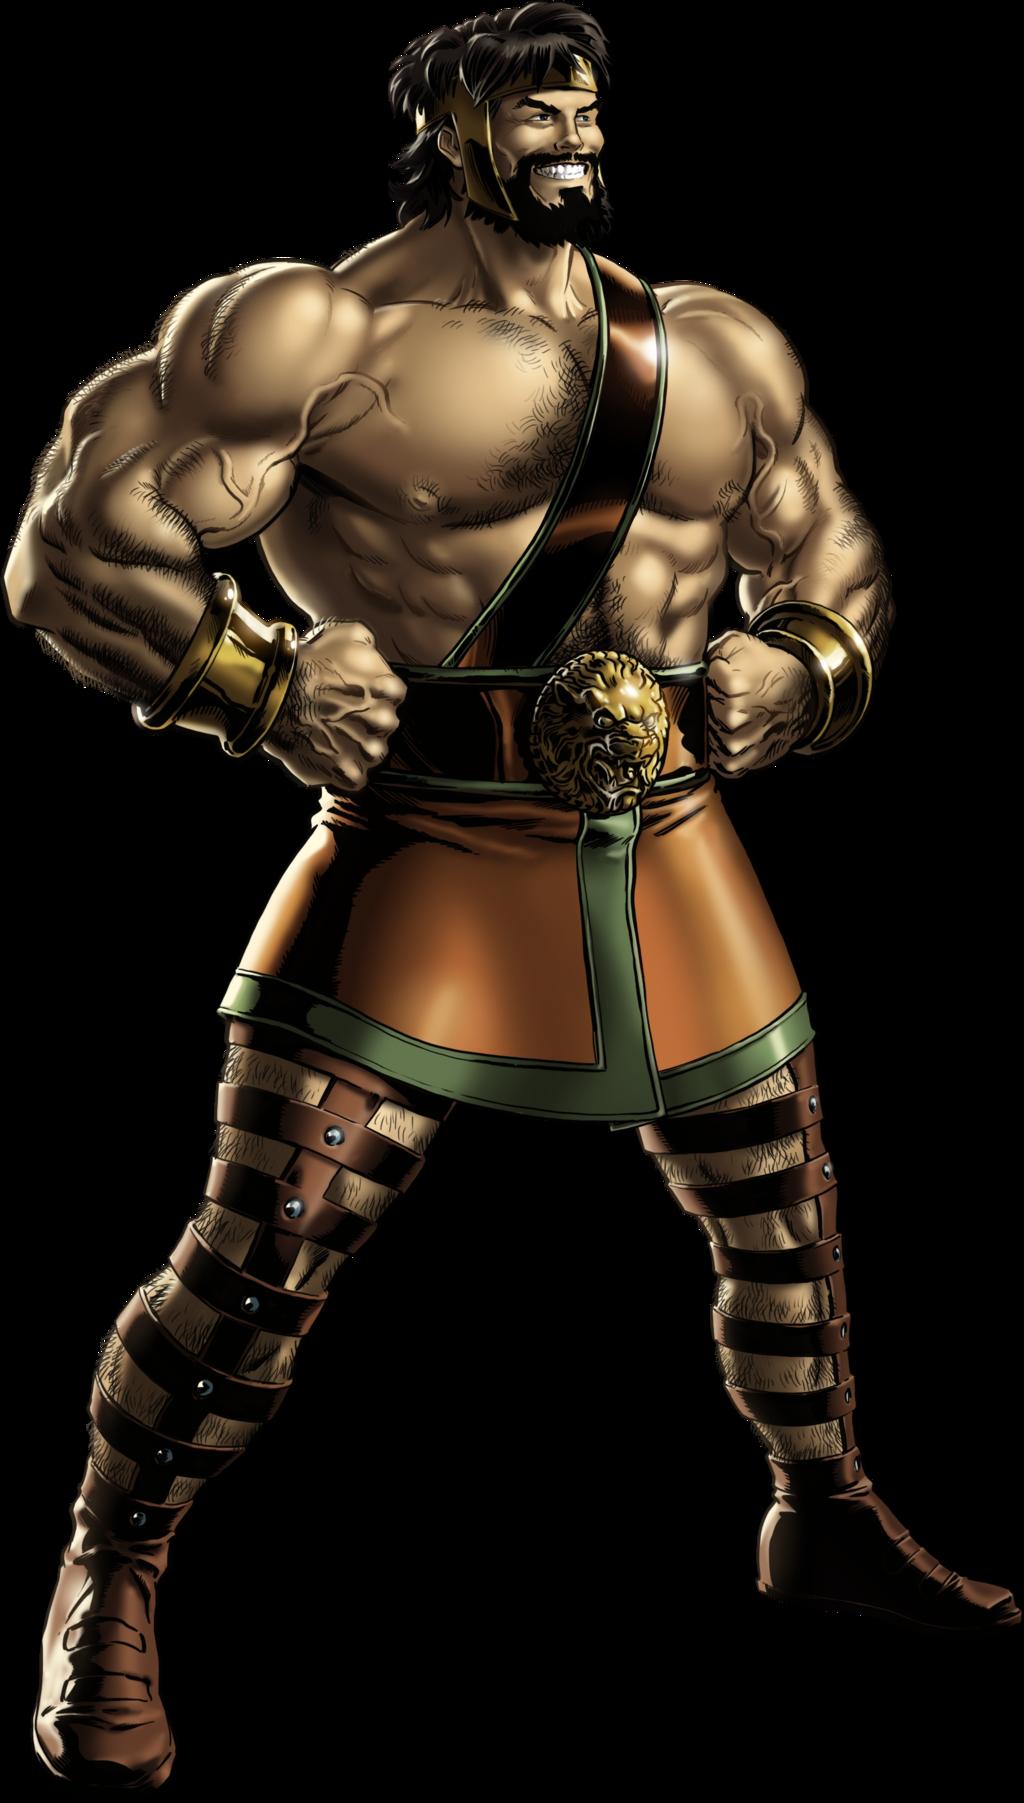 Marvel Avengers Alliance Hercules by ratatrampa87 1024x1803